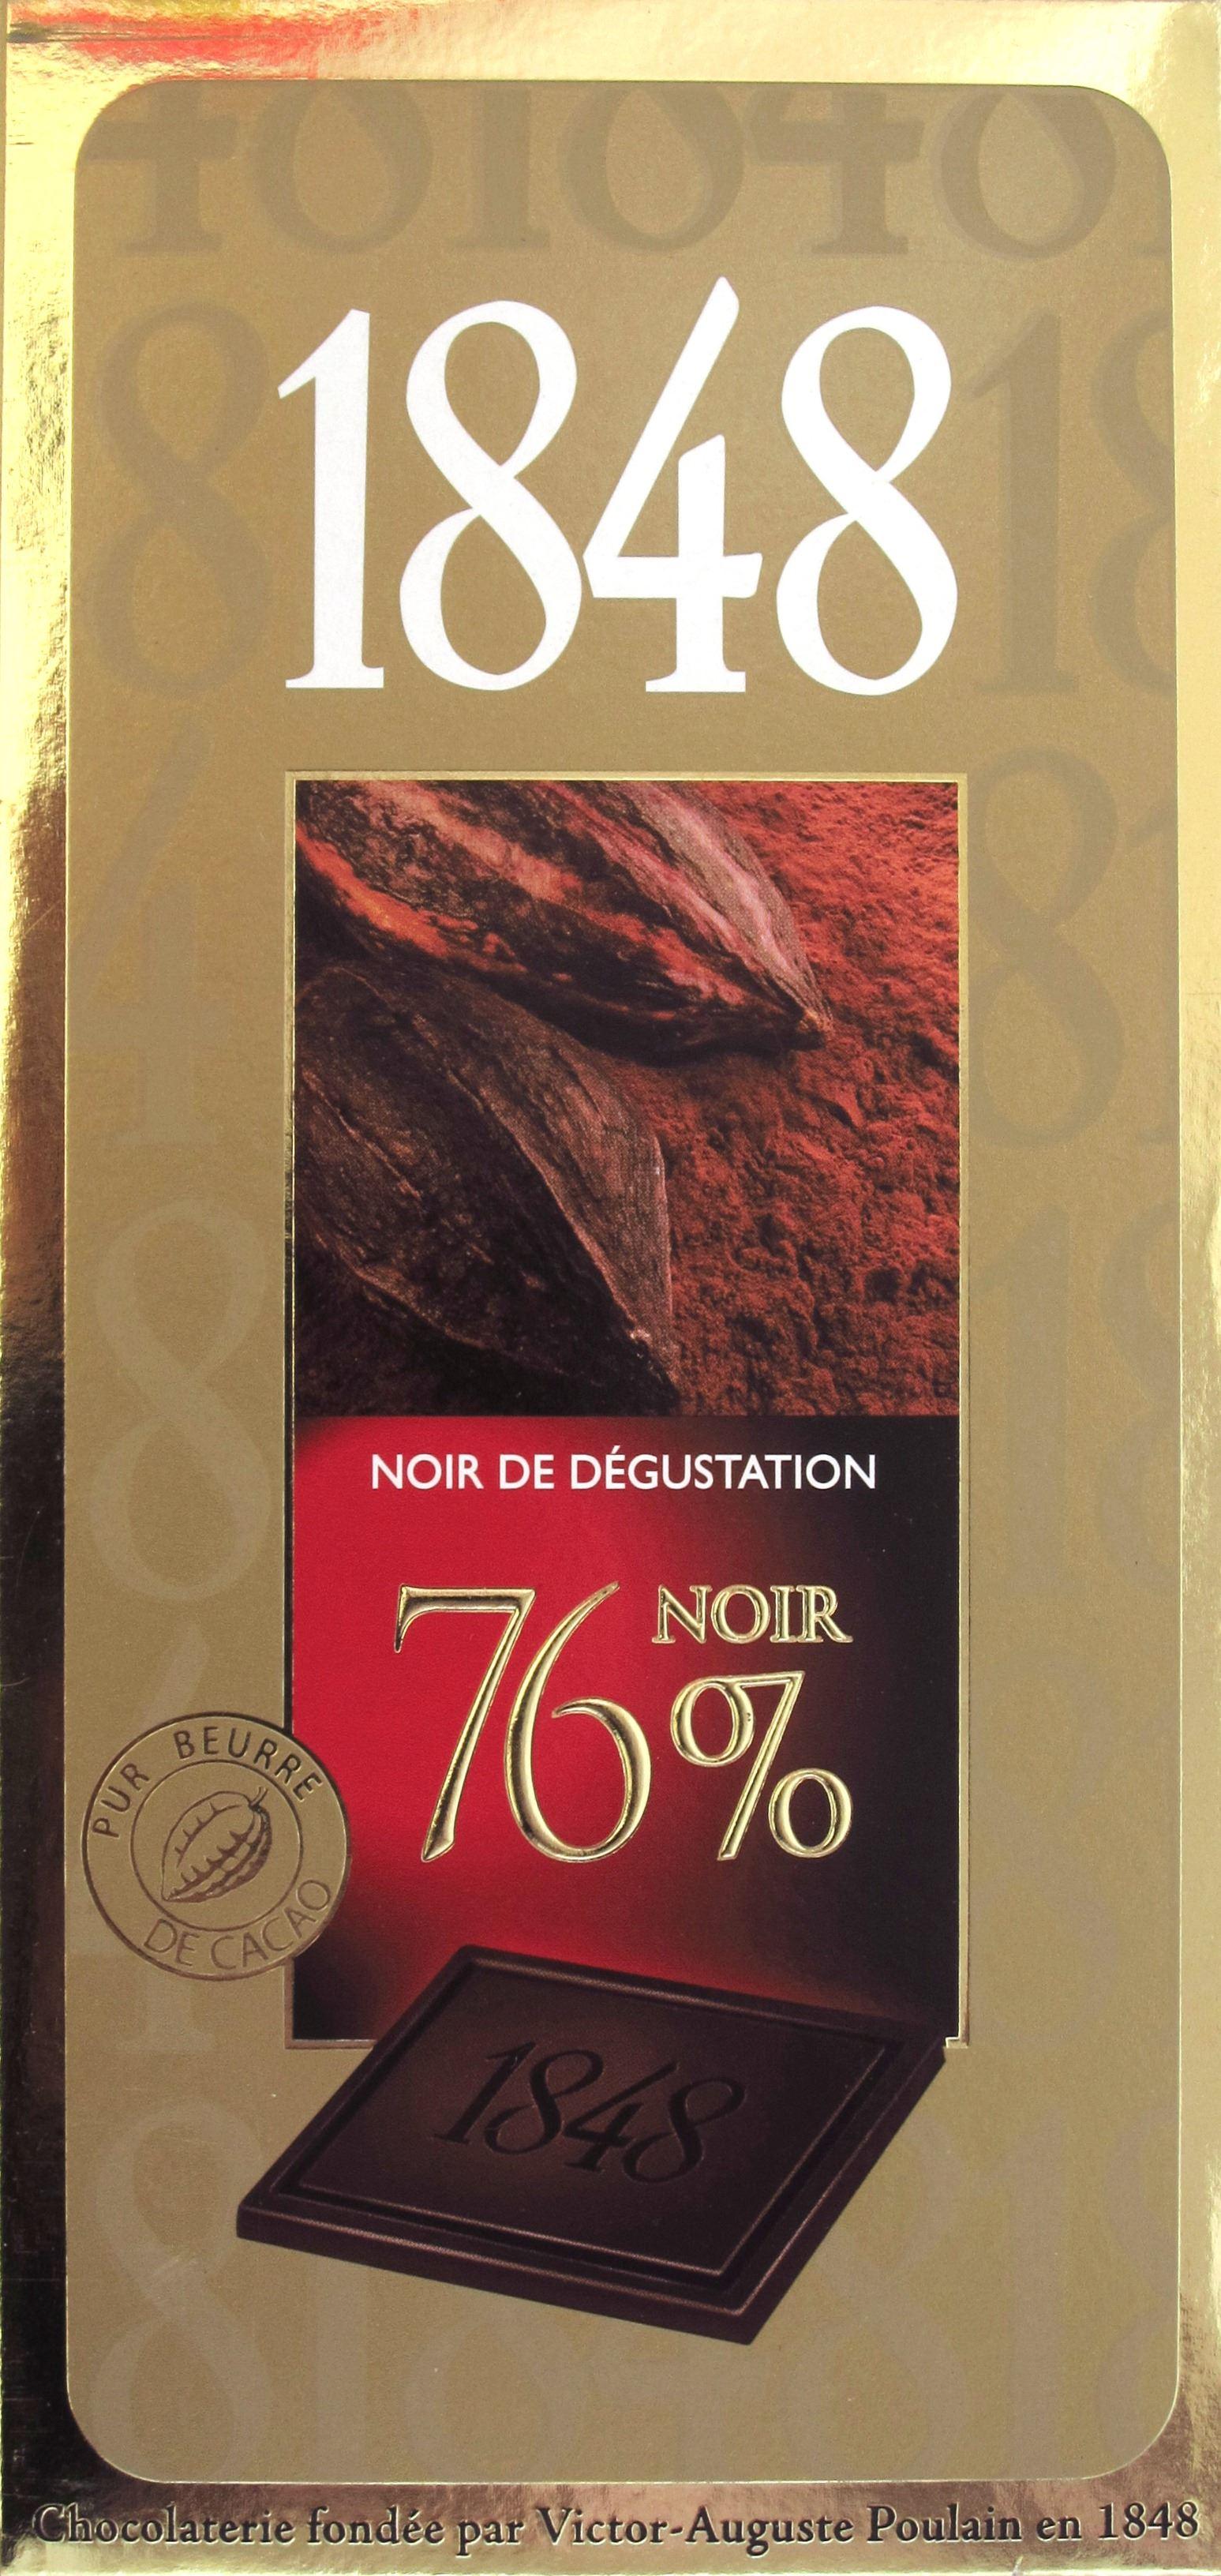 "Tafel Poulain ""1848"" 76%"